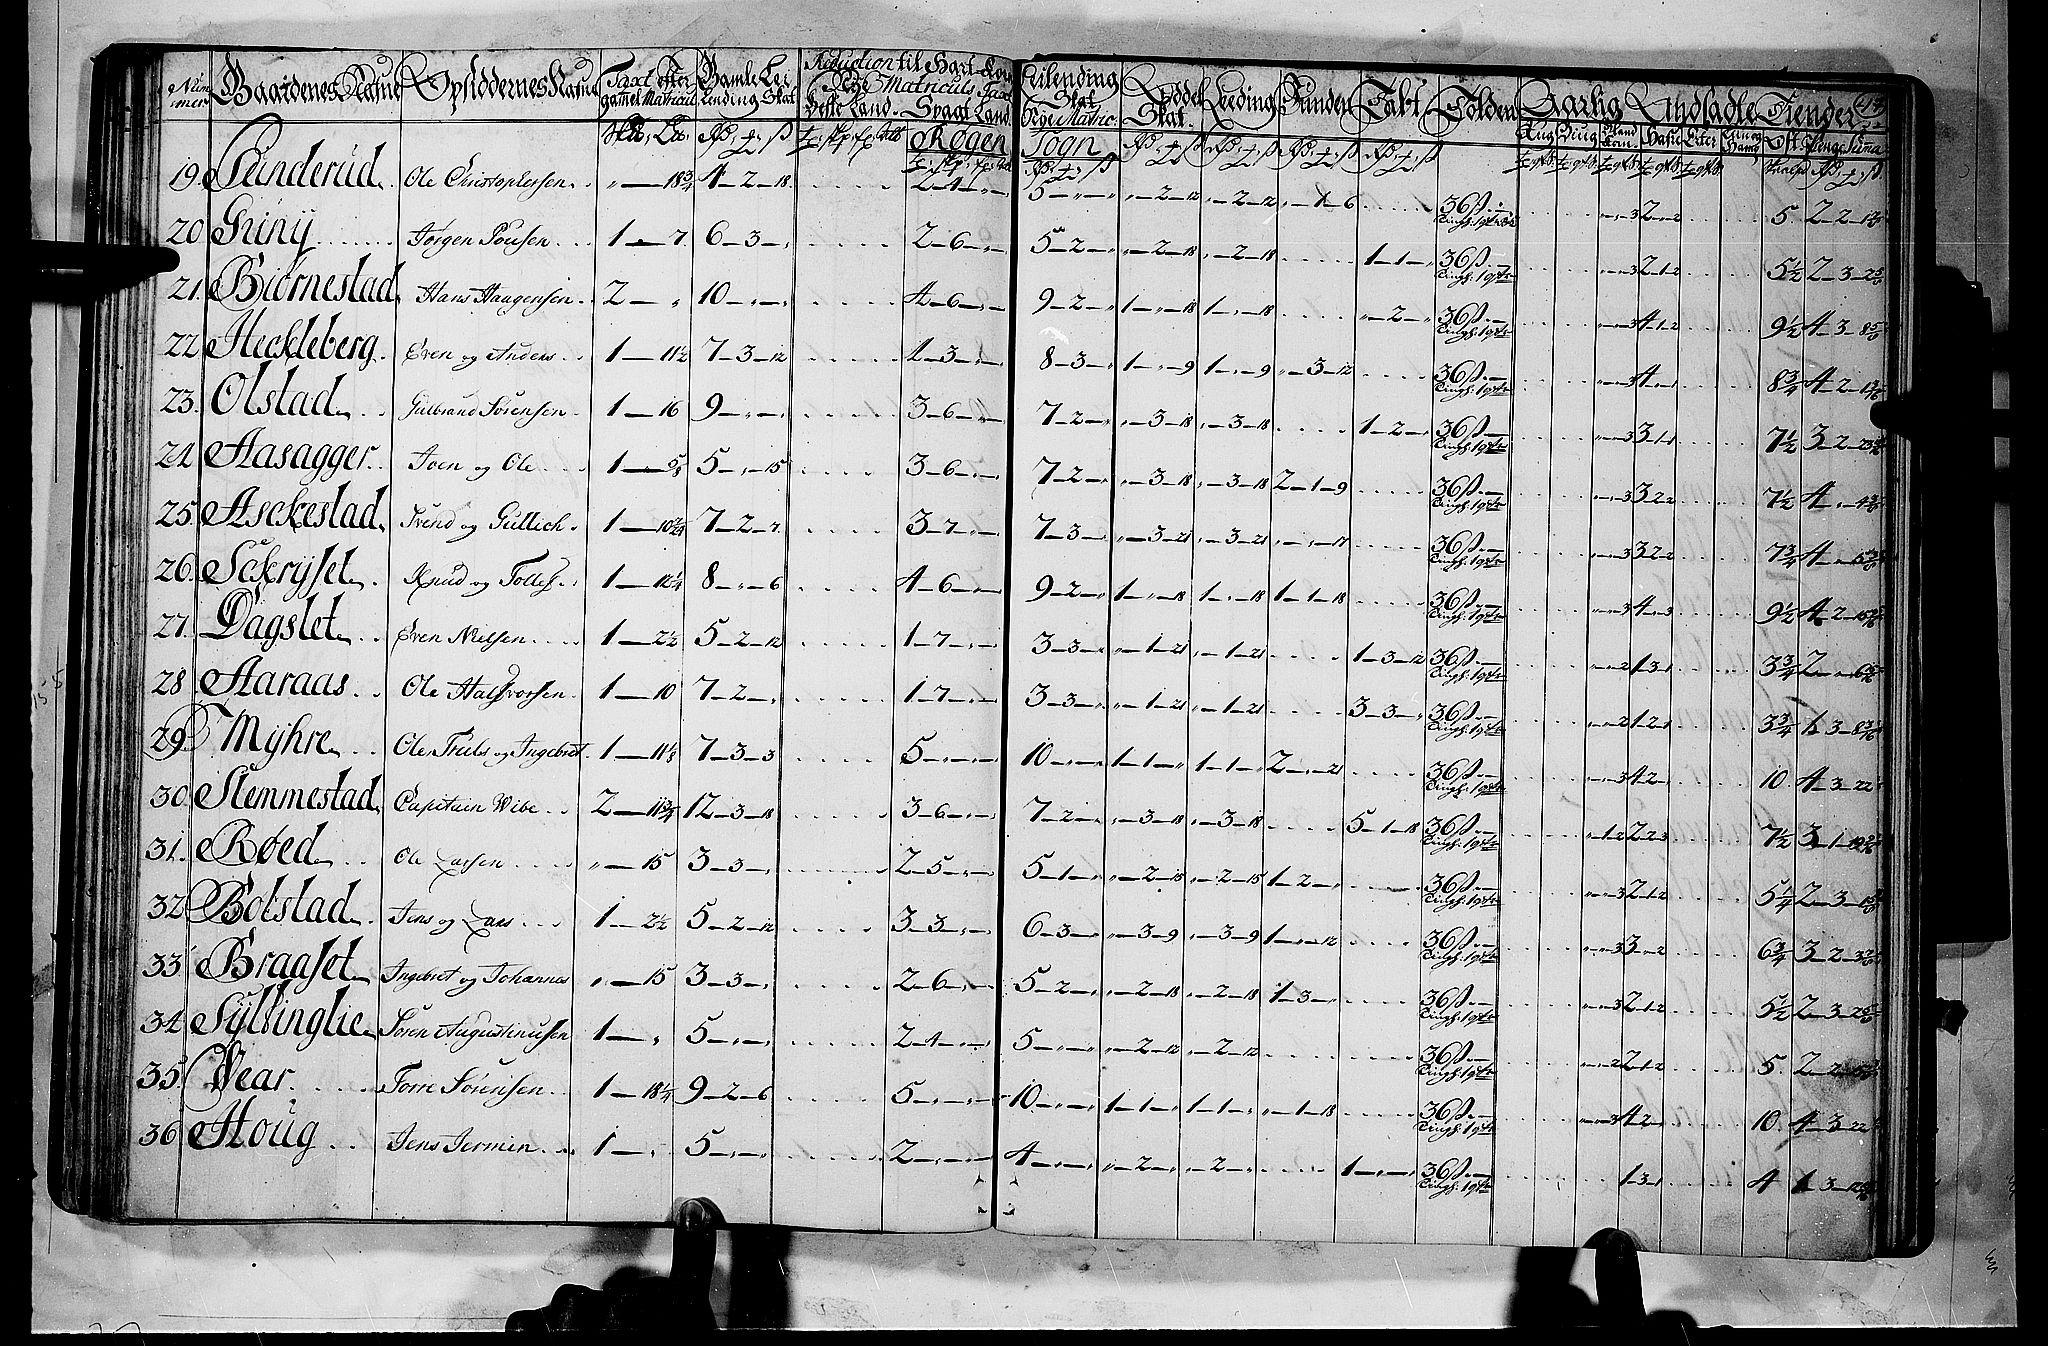 RA, Rentekammeret inntil 1814, Realistisk ordnet avdeling, N/Nb/Nbf/L0112: Buskerud matrikkelprotokoll, 1723, s. 49